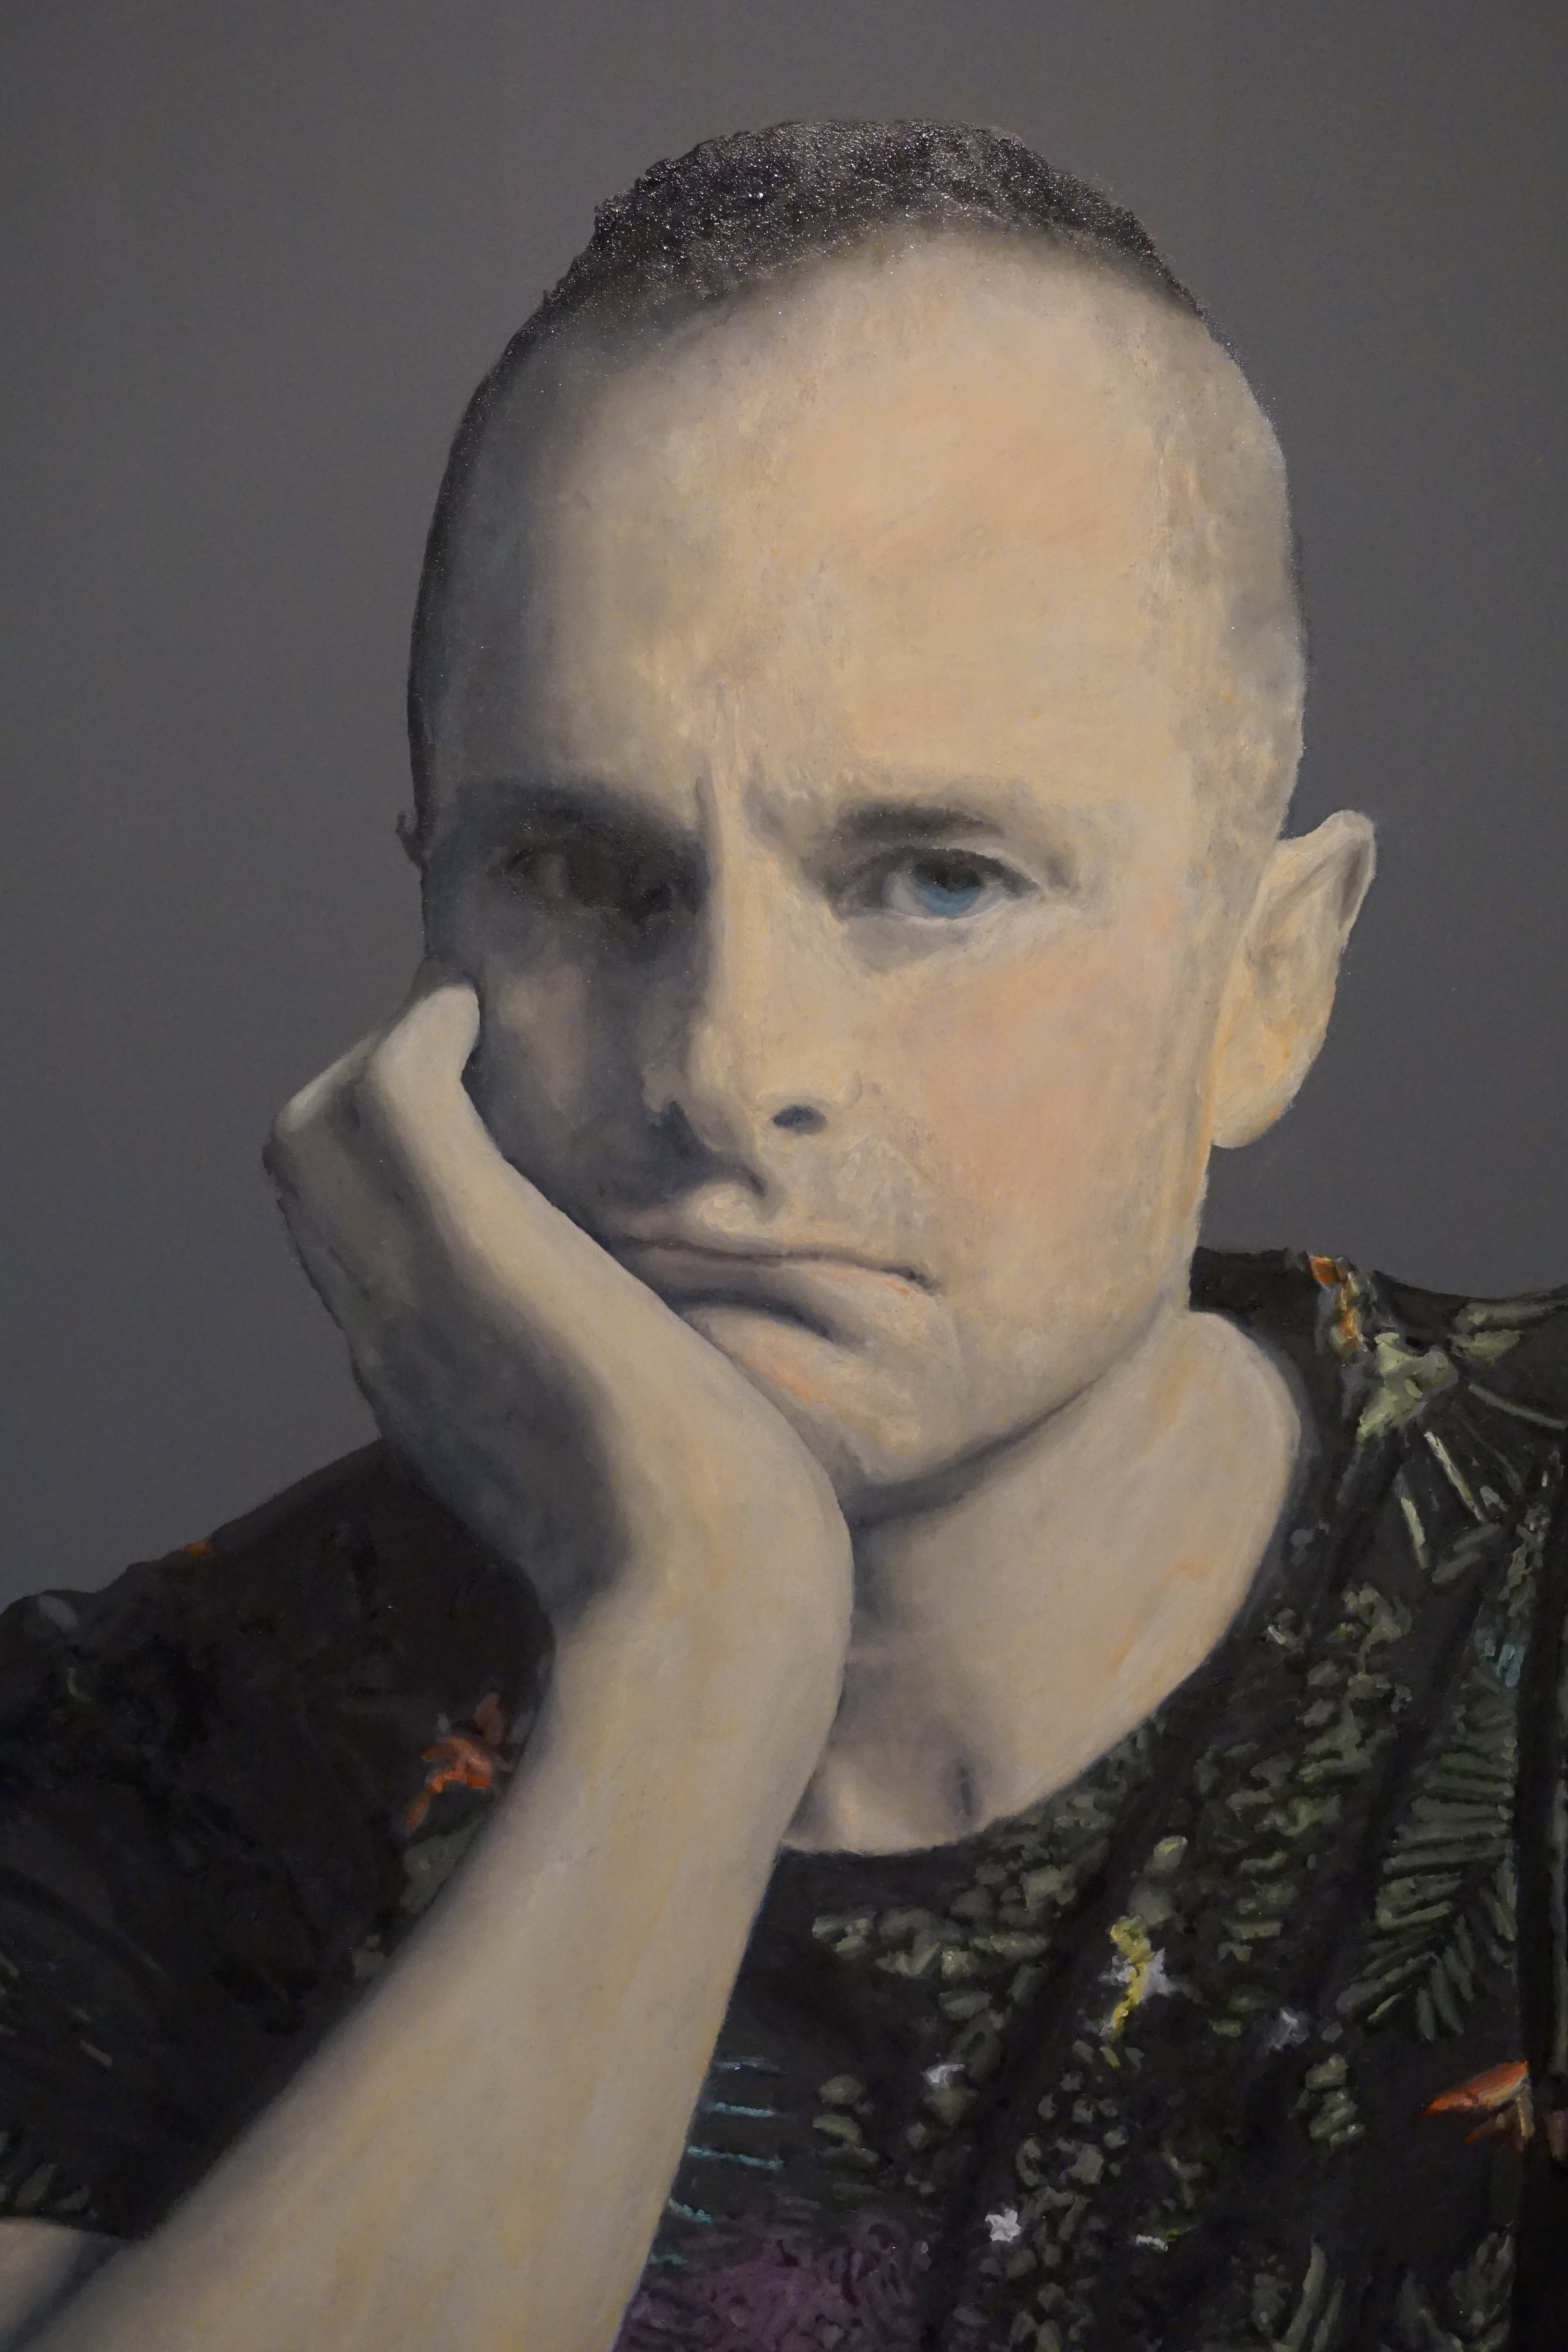 Melancholia-self-portrait-by-Jesse-Waugh.jpg